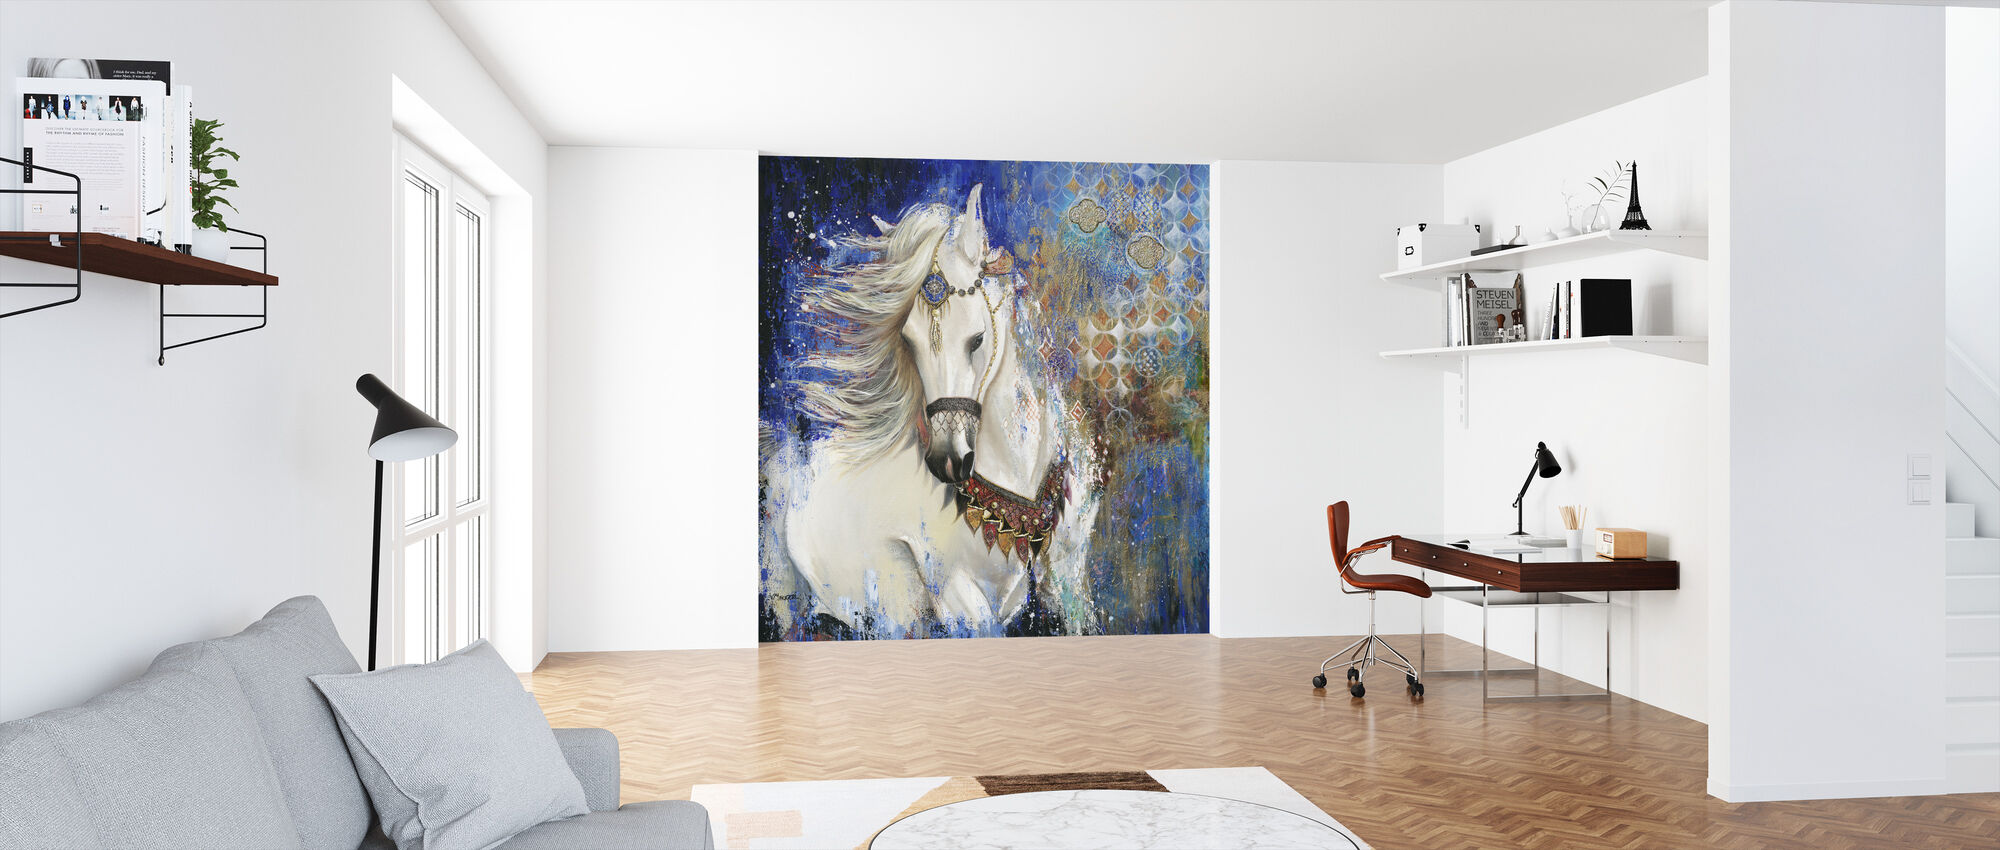 Wild Garden - Wallpaper - Office